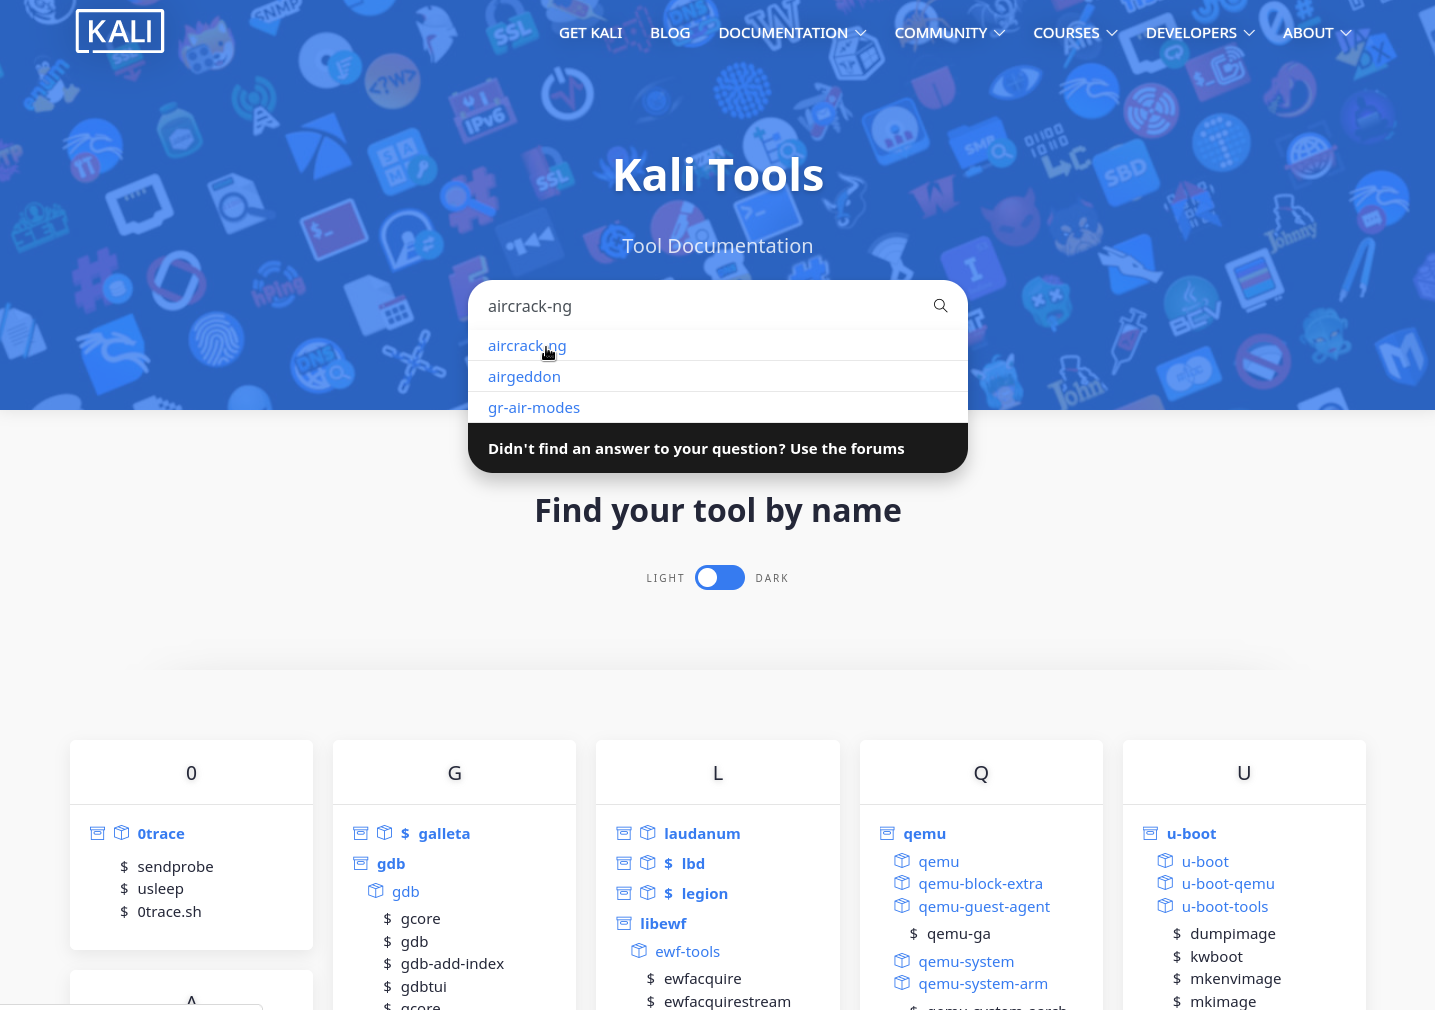 Kali tools